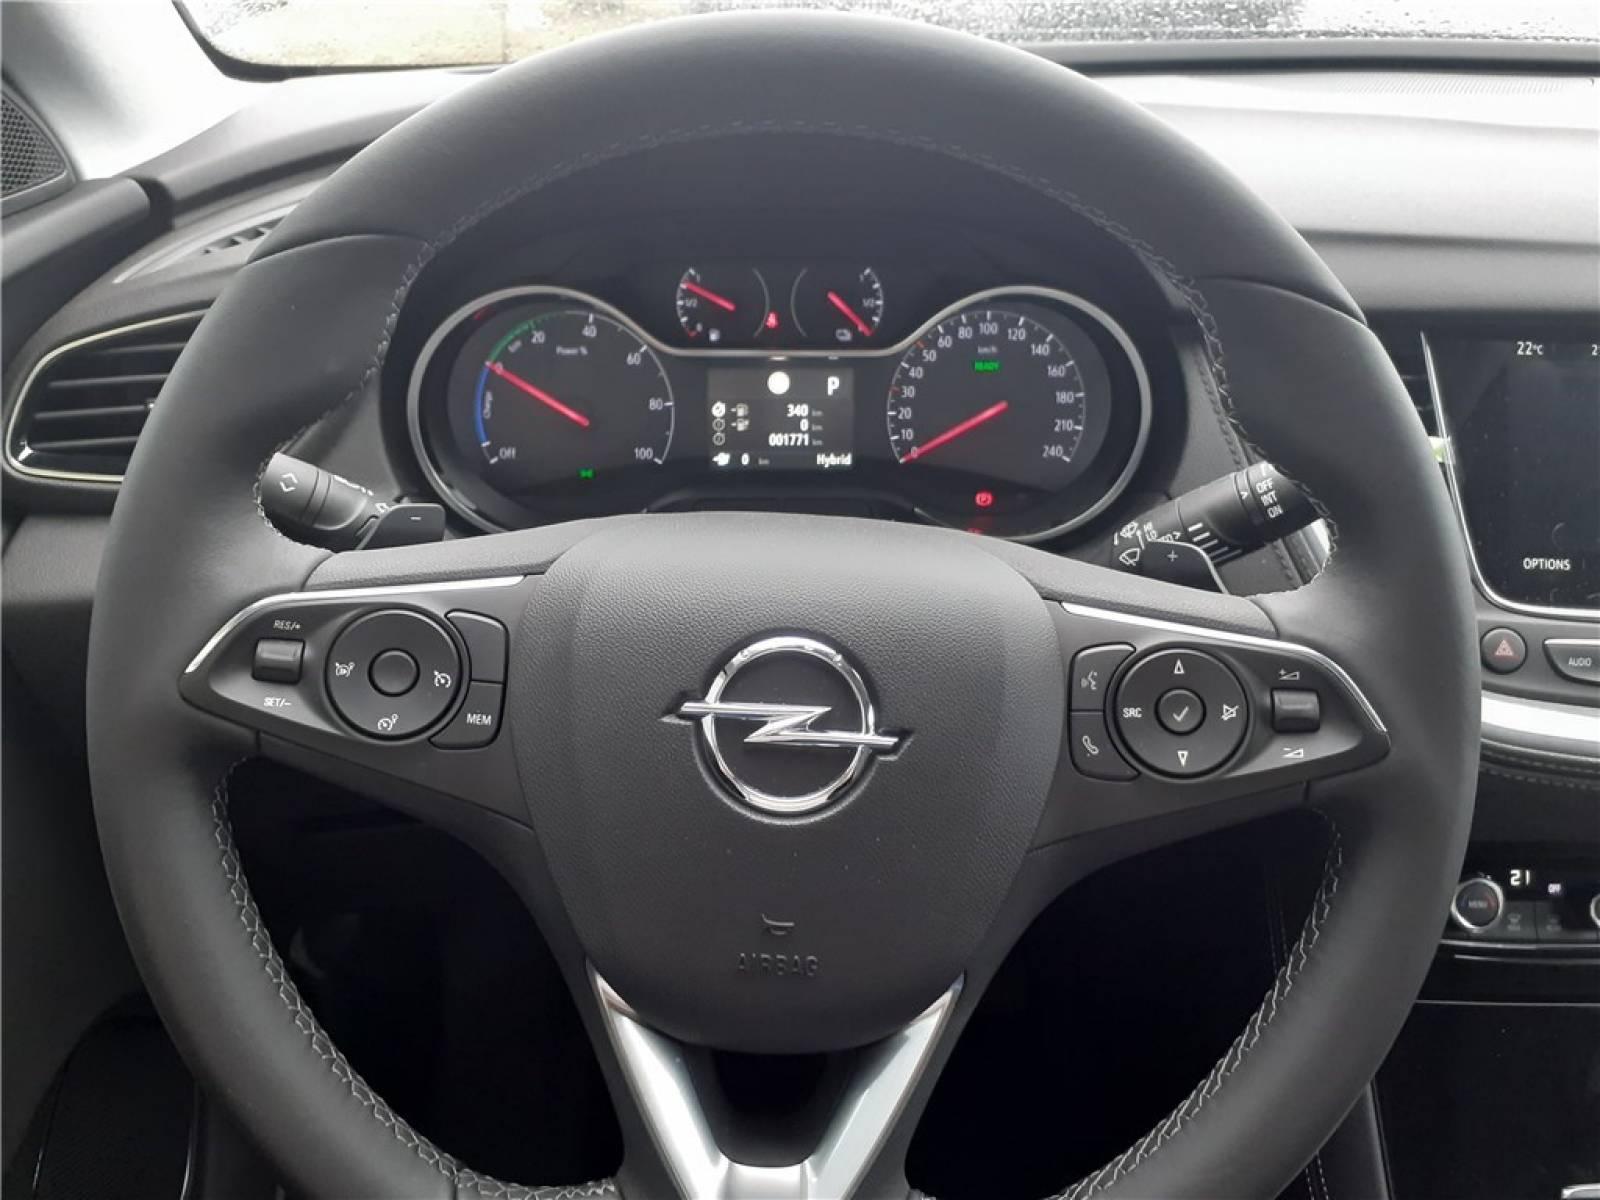 OPEL Grandland X Hybrid 225 ch BVA8 - véhicule d'occasion - Groupe Guillet - Opel Magicauto - Chalon-sur-Saône - 71380 - Saint-Marcel - 39